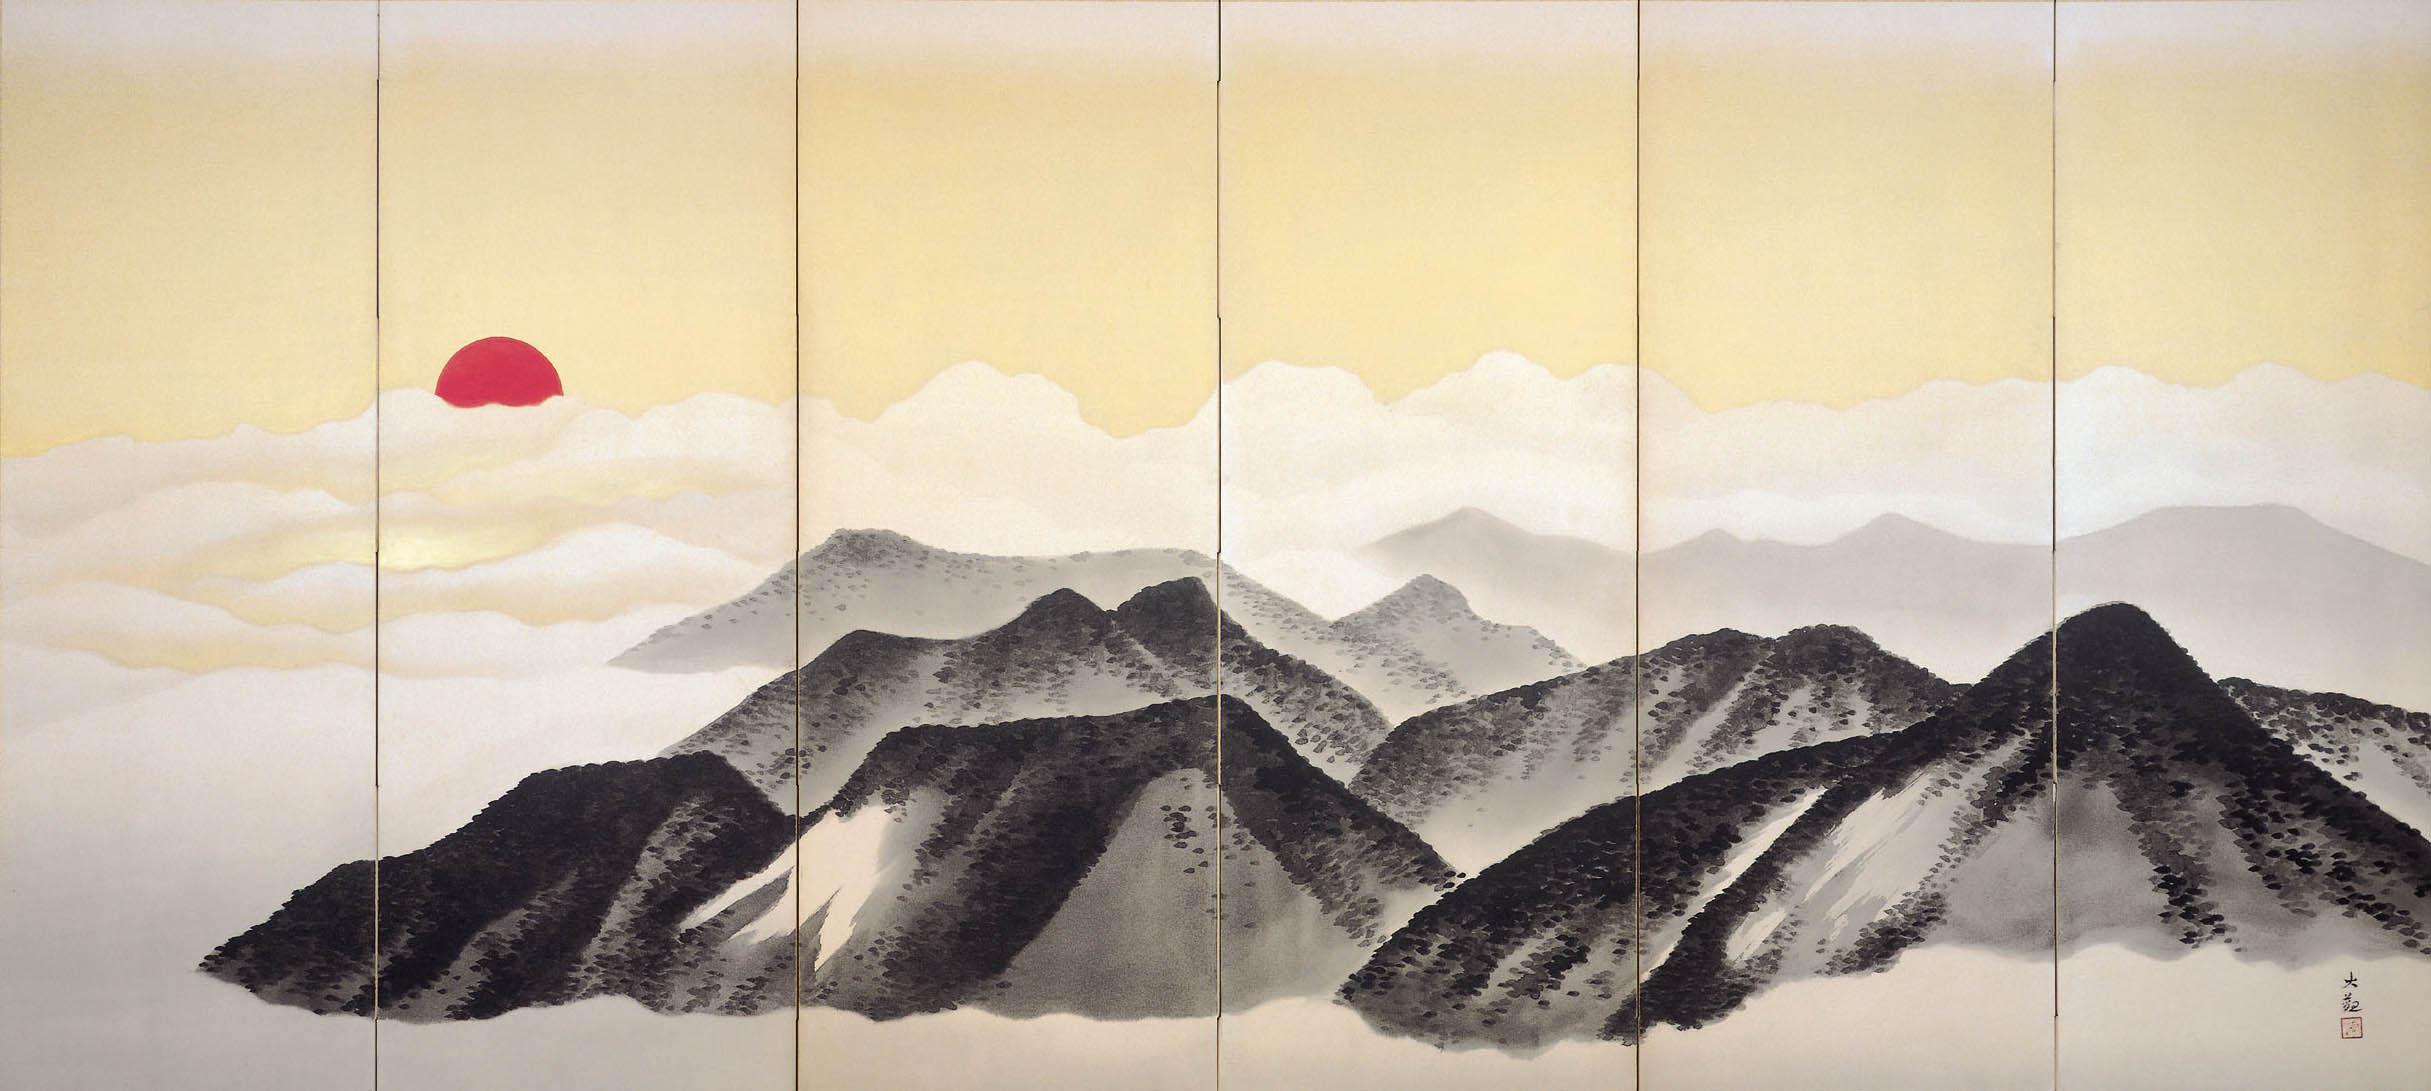 "(c) The Dry Landscape Garden, Yokoyama Taikan ""Mt. Fuji"" (1932)"